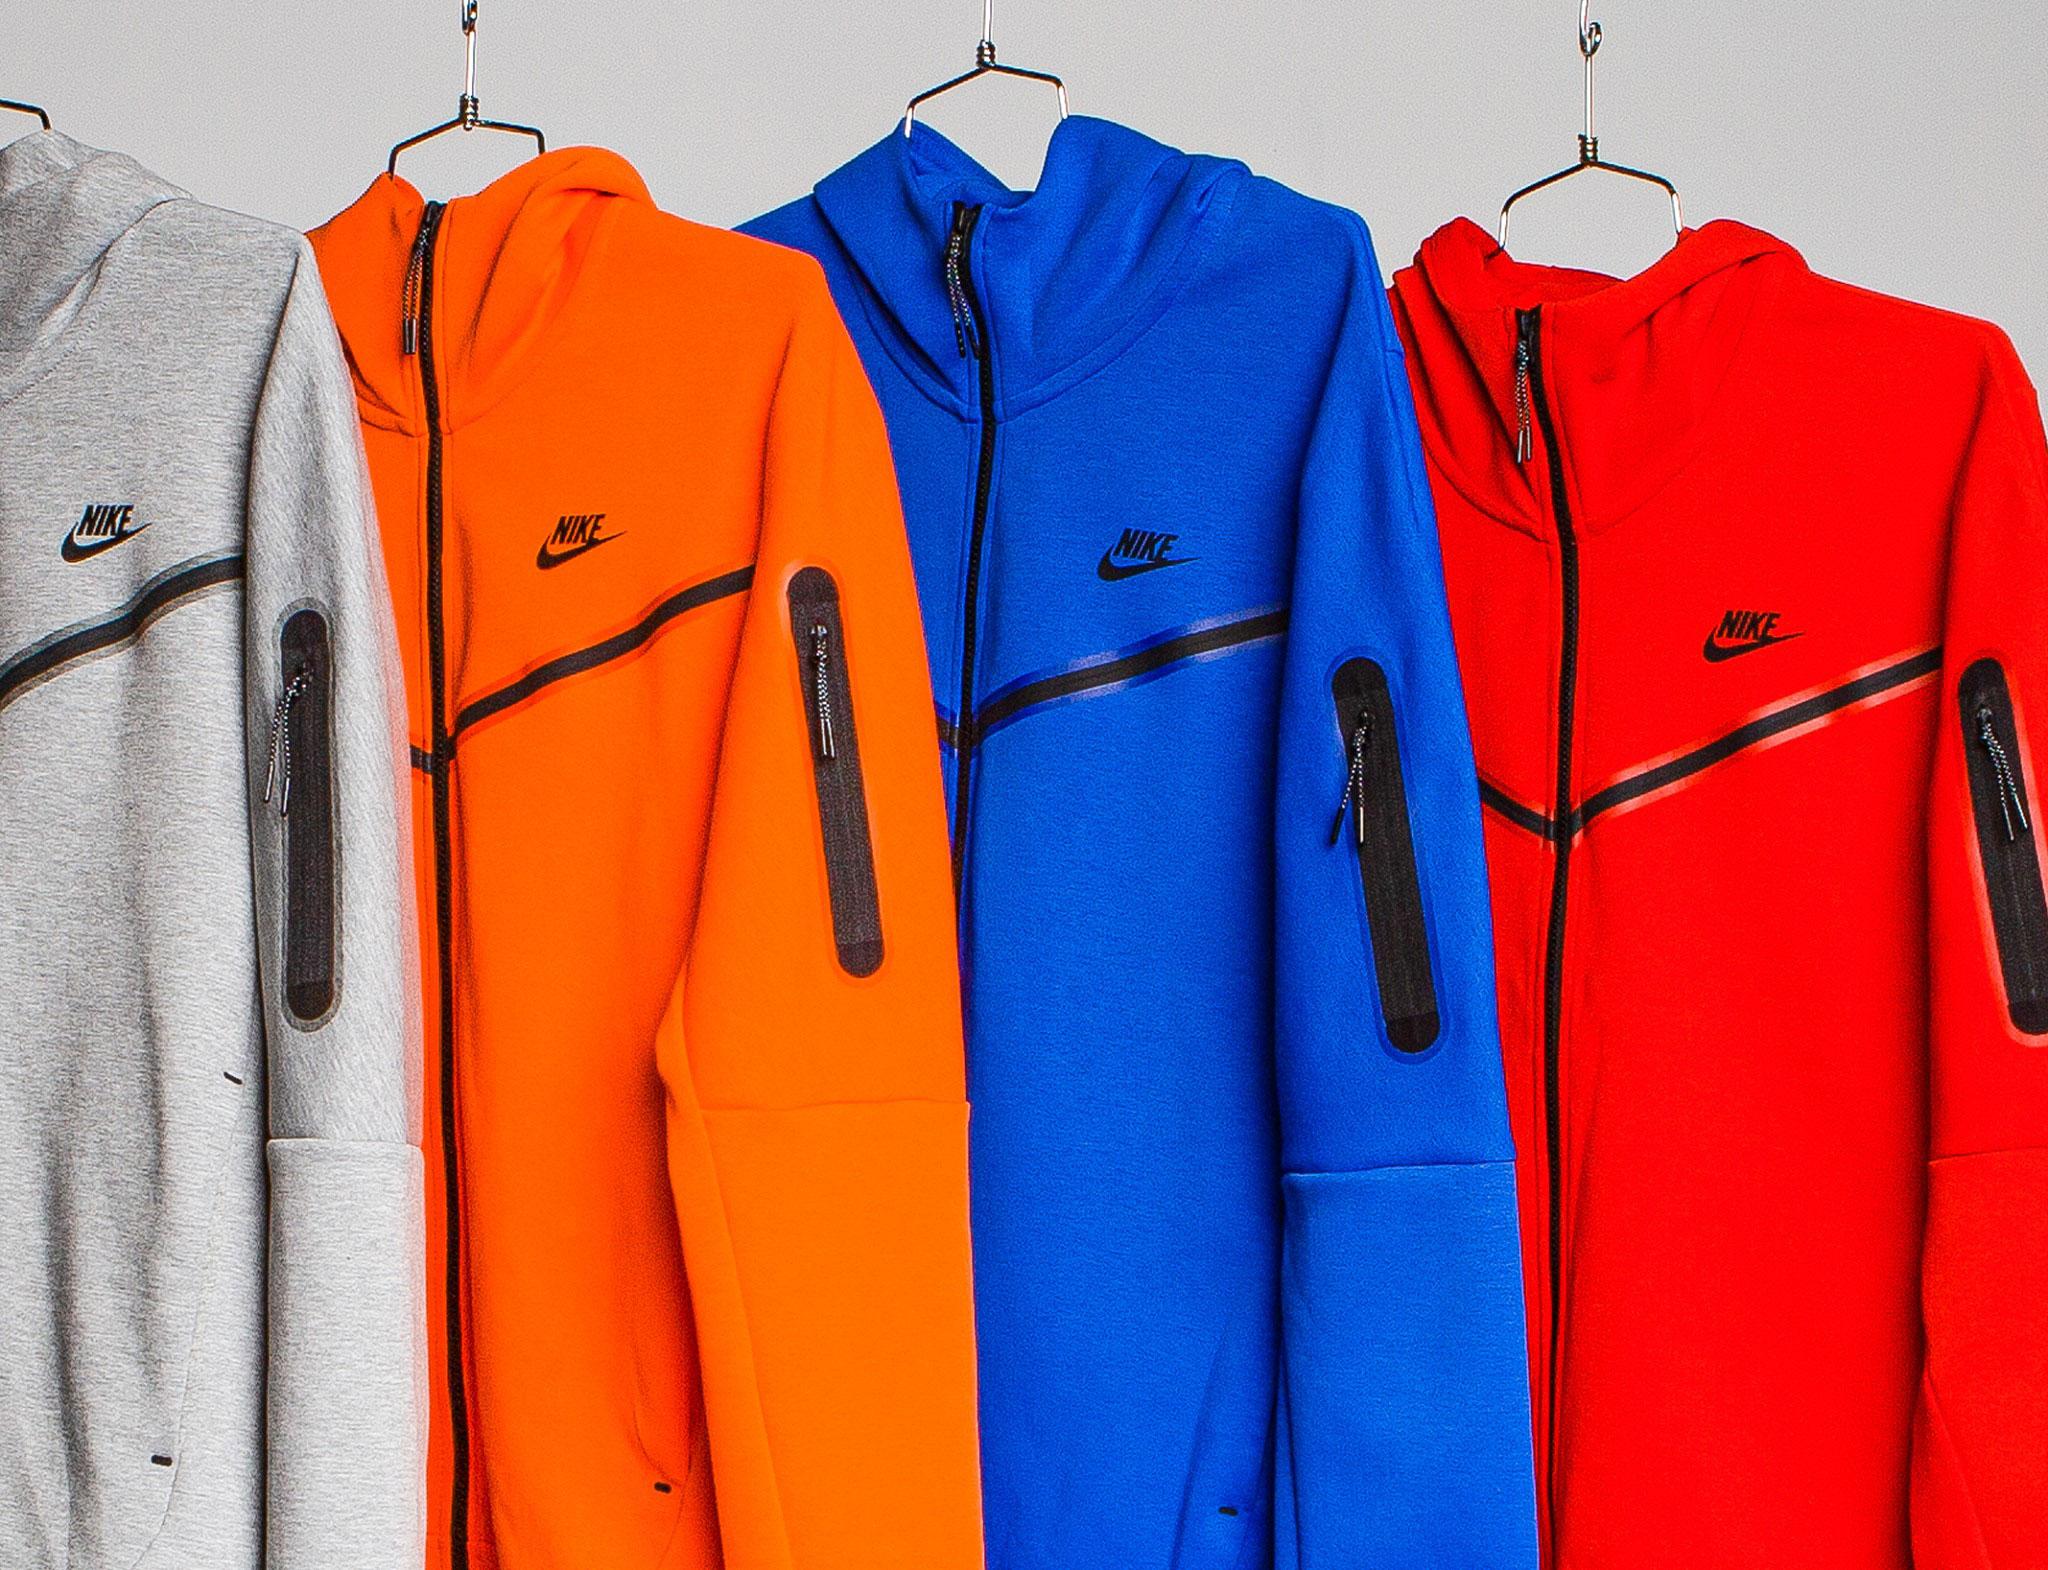 Nike Tech Fleece Hoodies Fall 2020